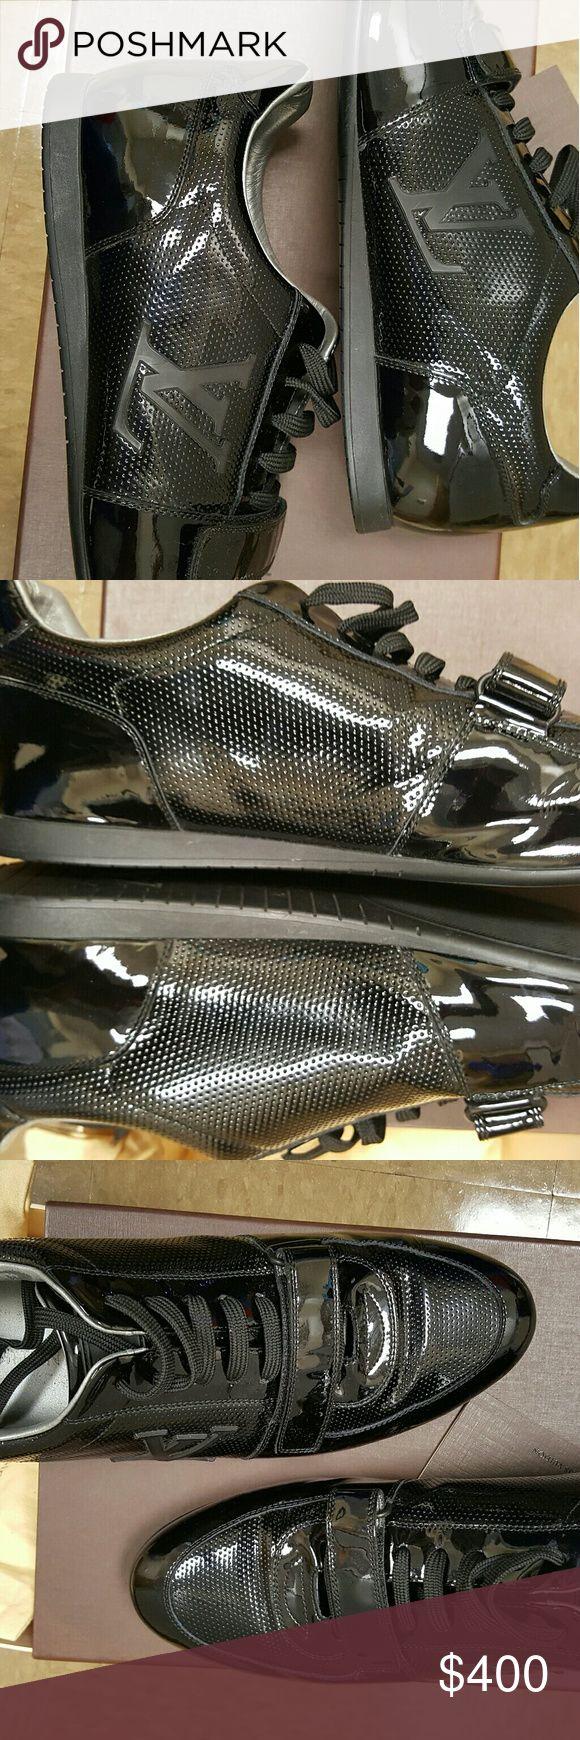 Authentic Louis Vuitton Men's Shoes Authentic Men's shoes only worn twice. Comes with original box and shoe bags. Louis Vuitton Shoes Loafers & Slip-Ons